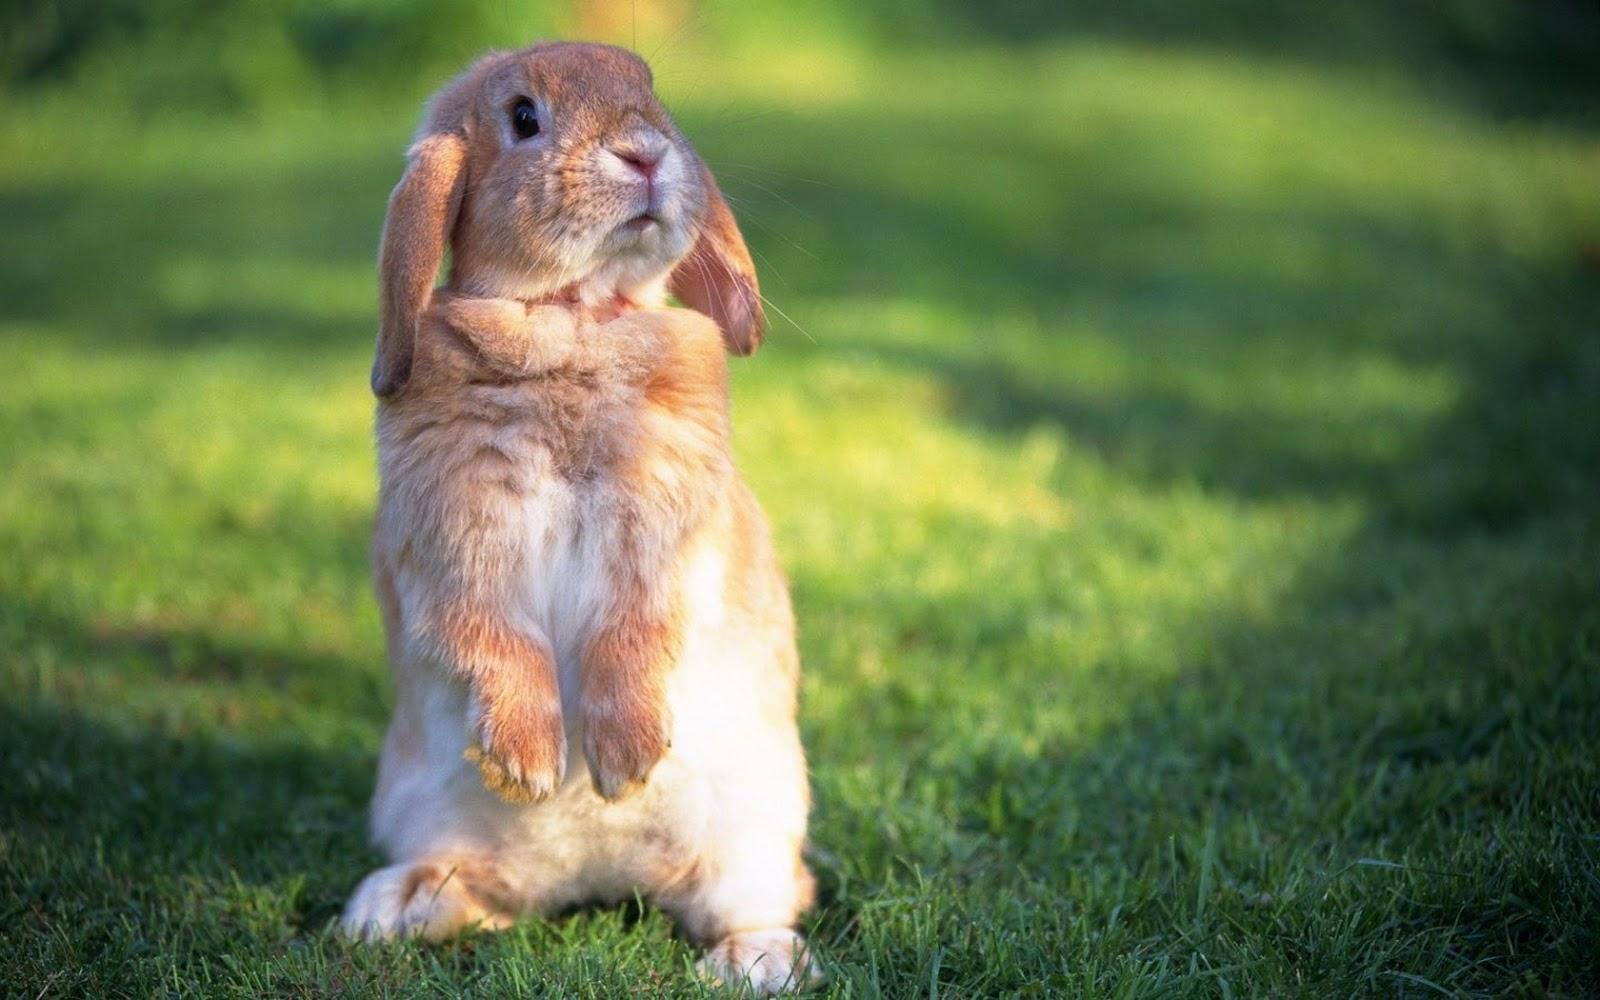 Rabbit Wallpaper HD #6863414